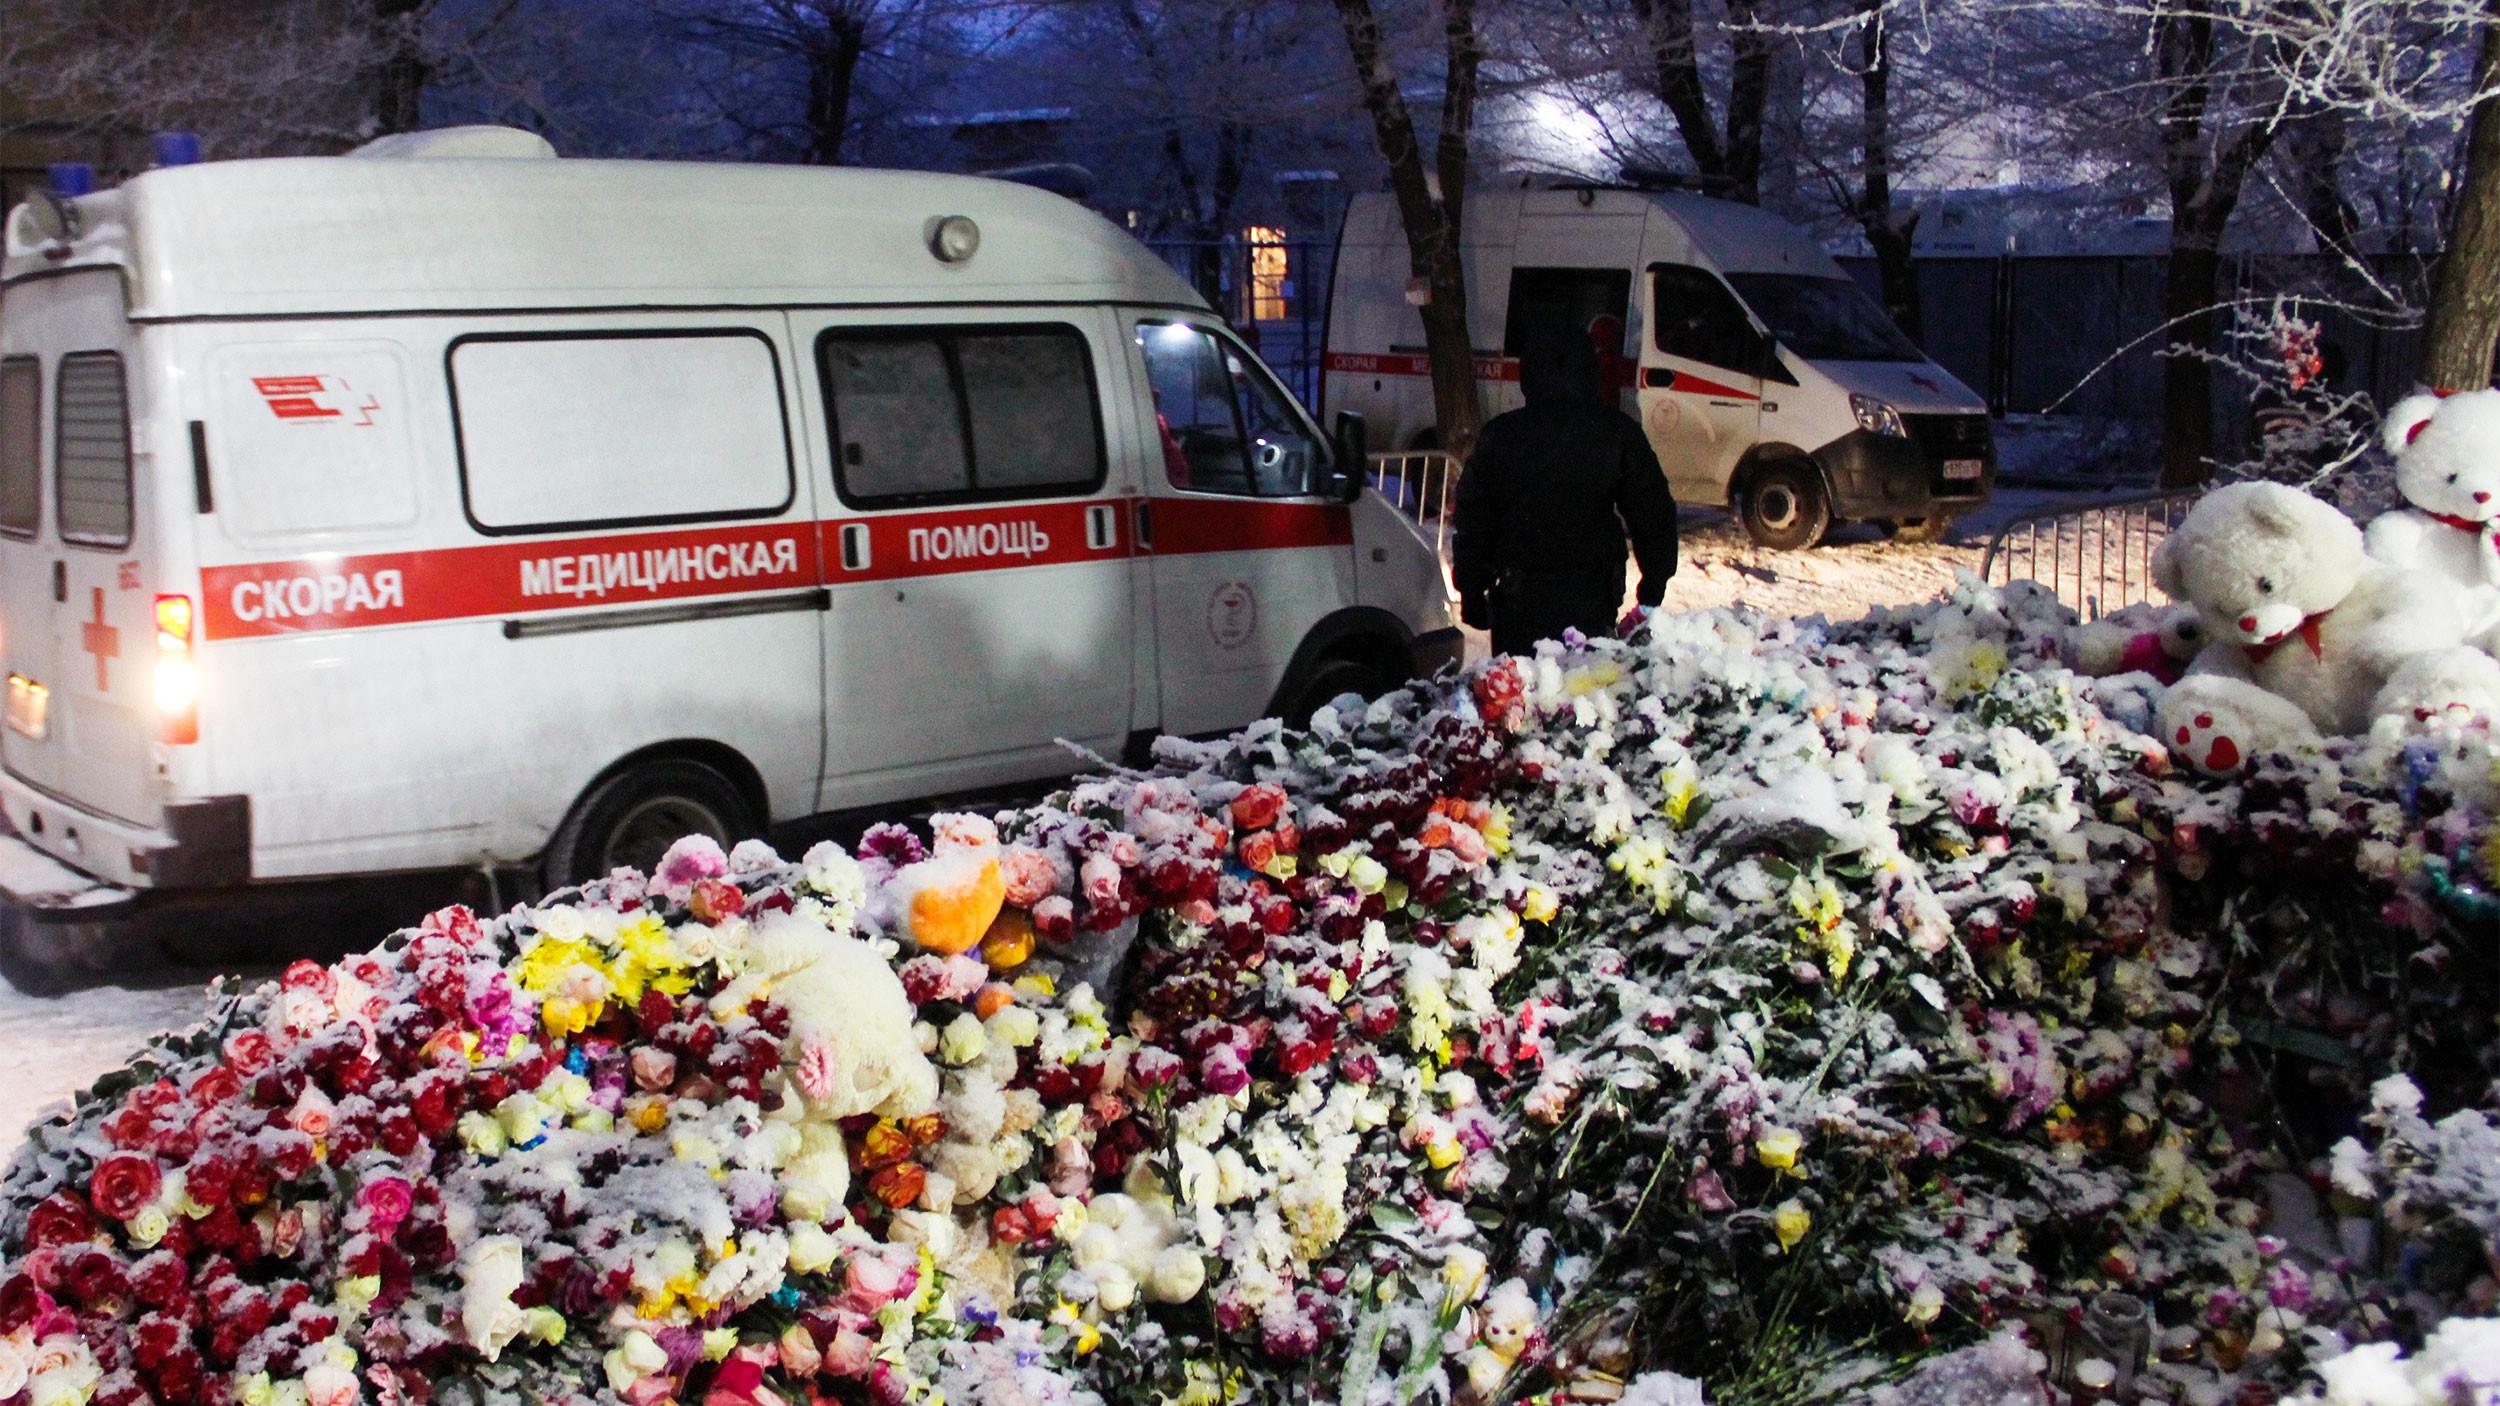 <p><span>Фото: &copy; РИА Новости/</span>Илья Московец</p>